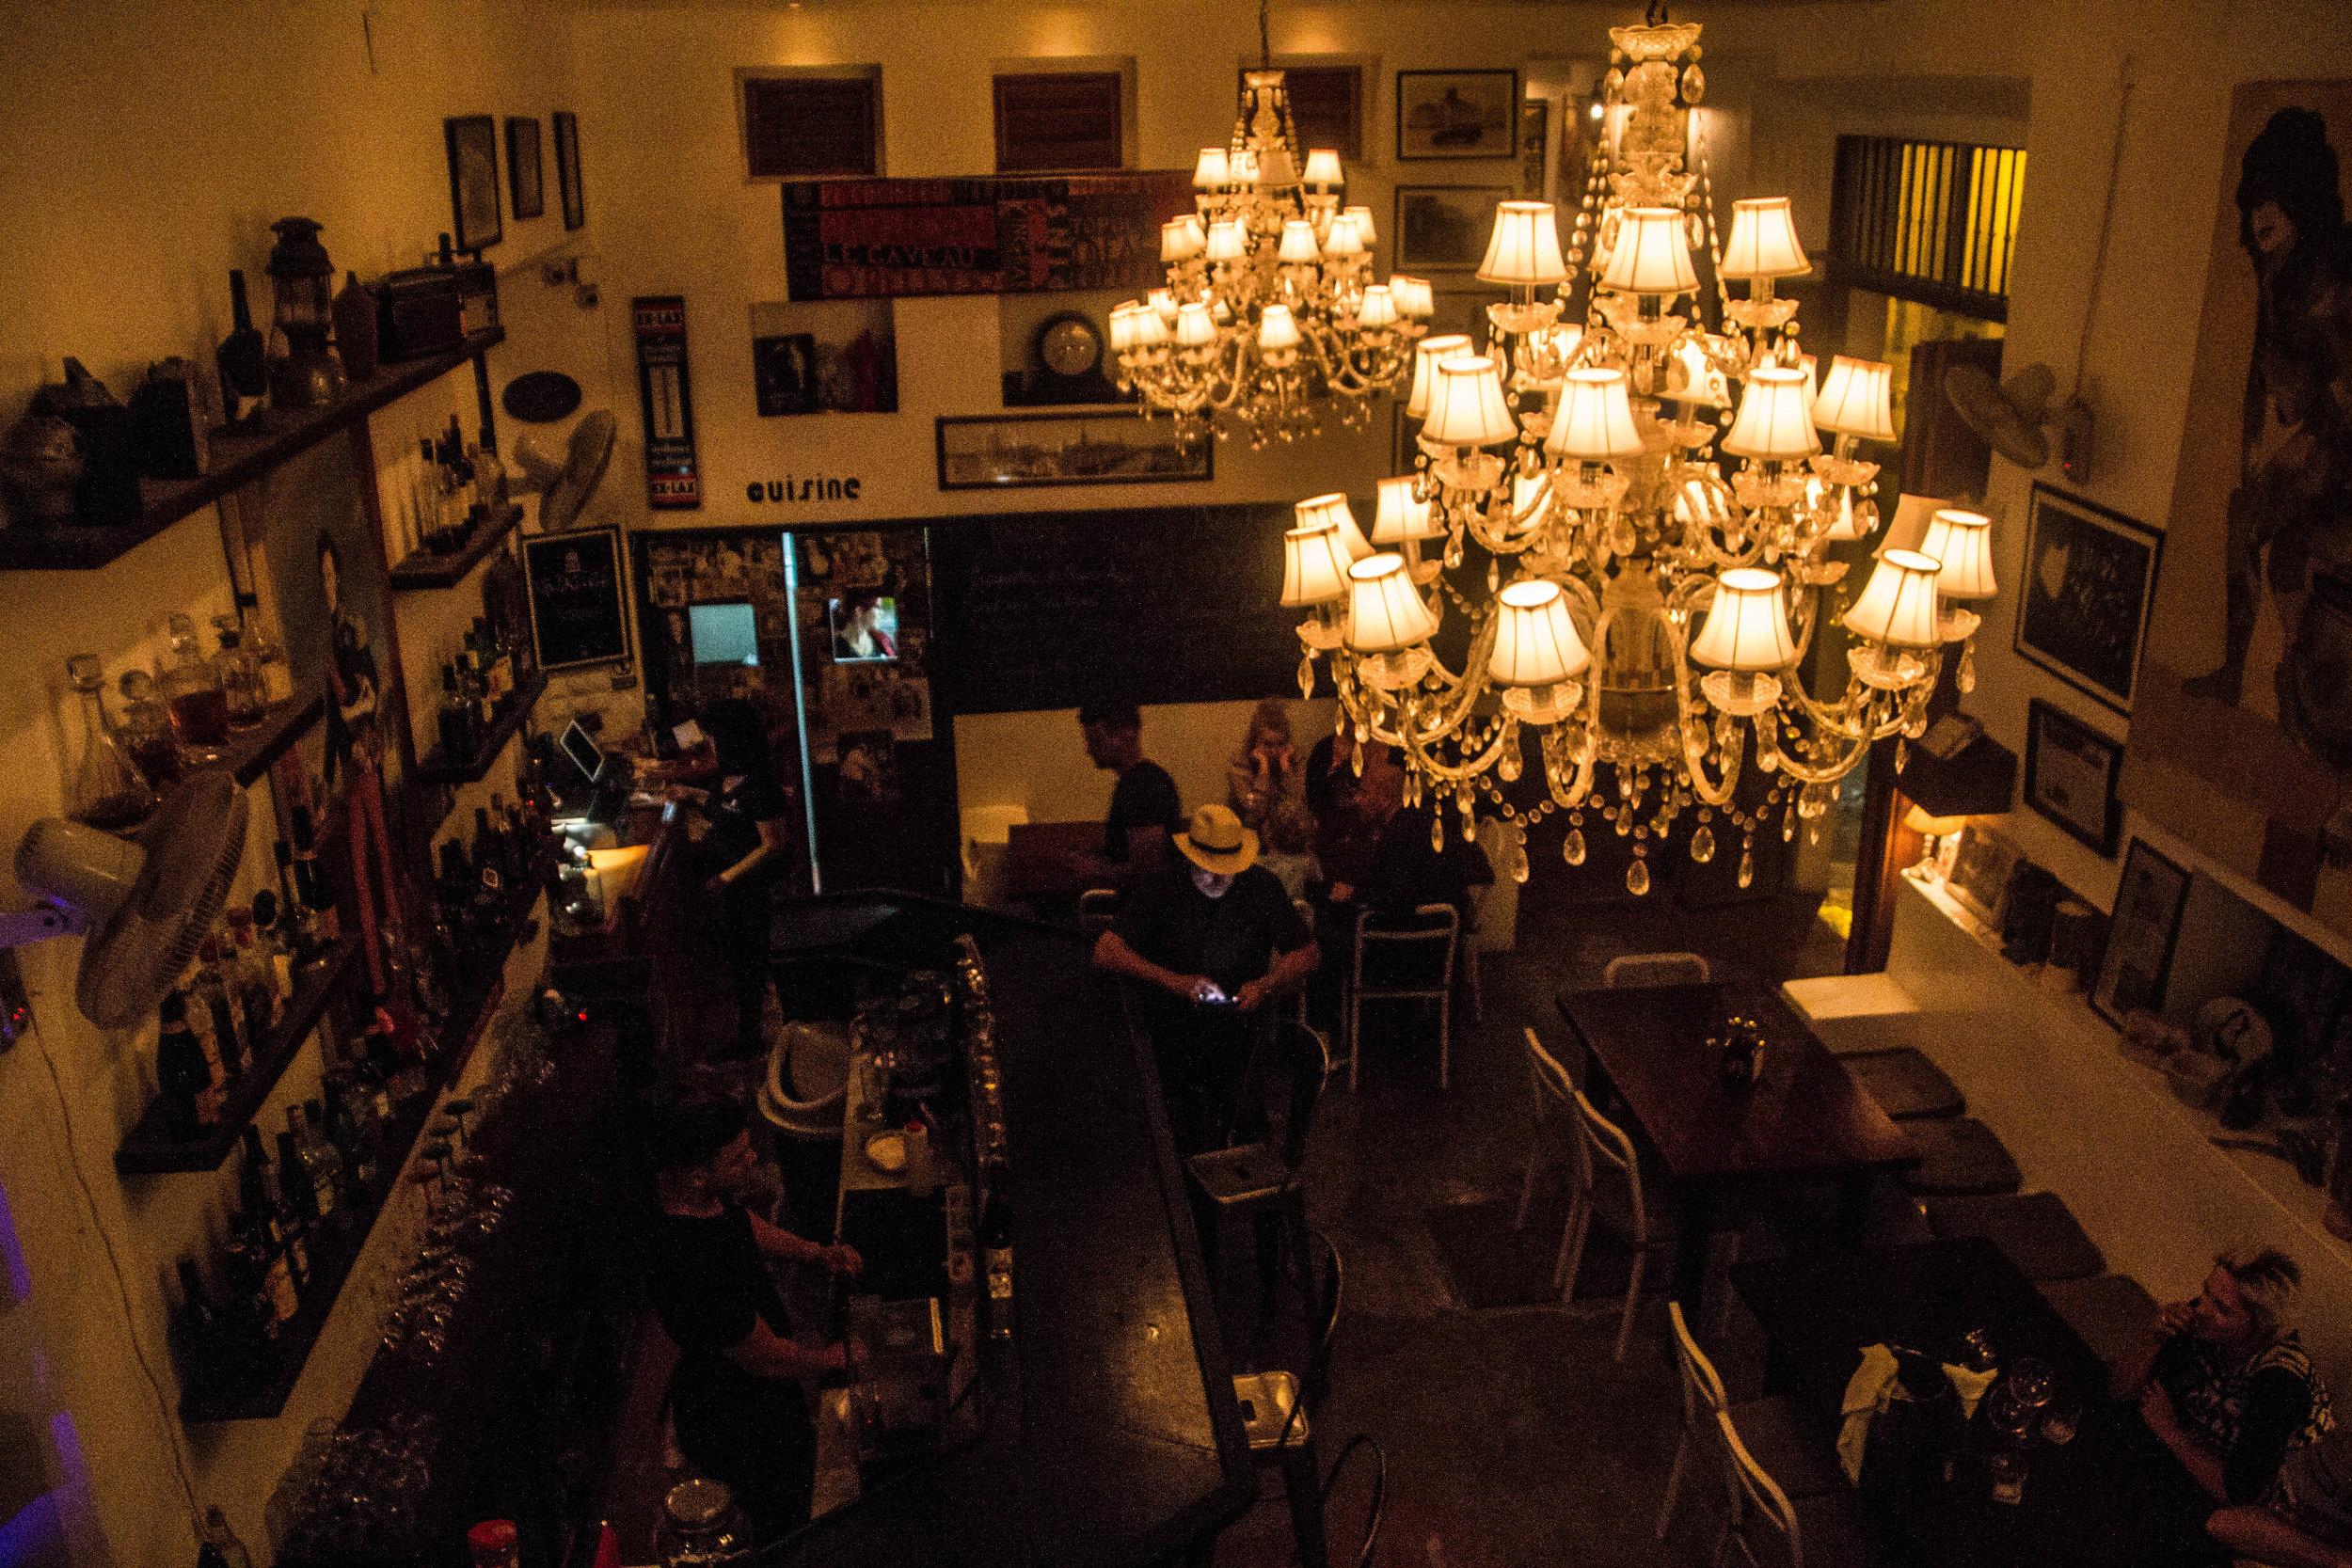 sia kara cafe havana nightlife cuba-1-4.jpg